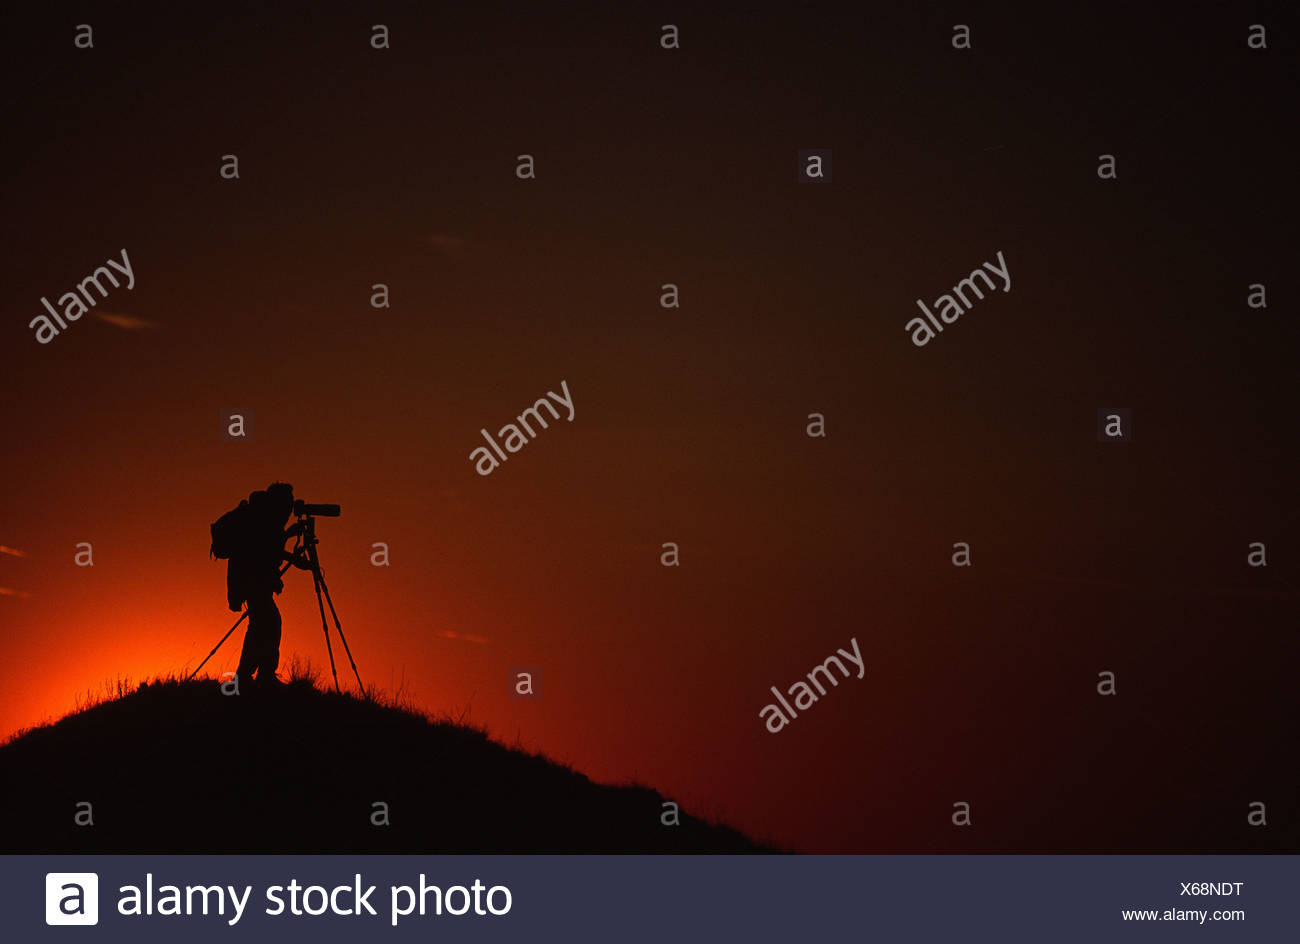 Silhouette of Photographer at Sunset, near Eagle Butte, Grasslands National Park, Saskatchewan Stock Photo